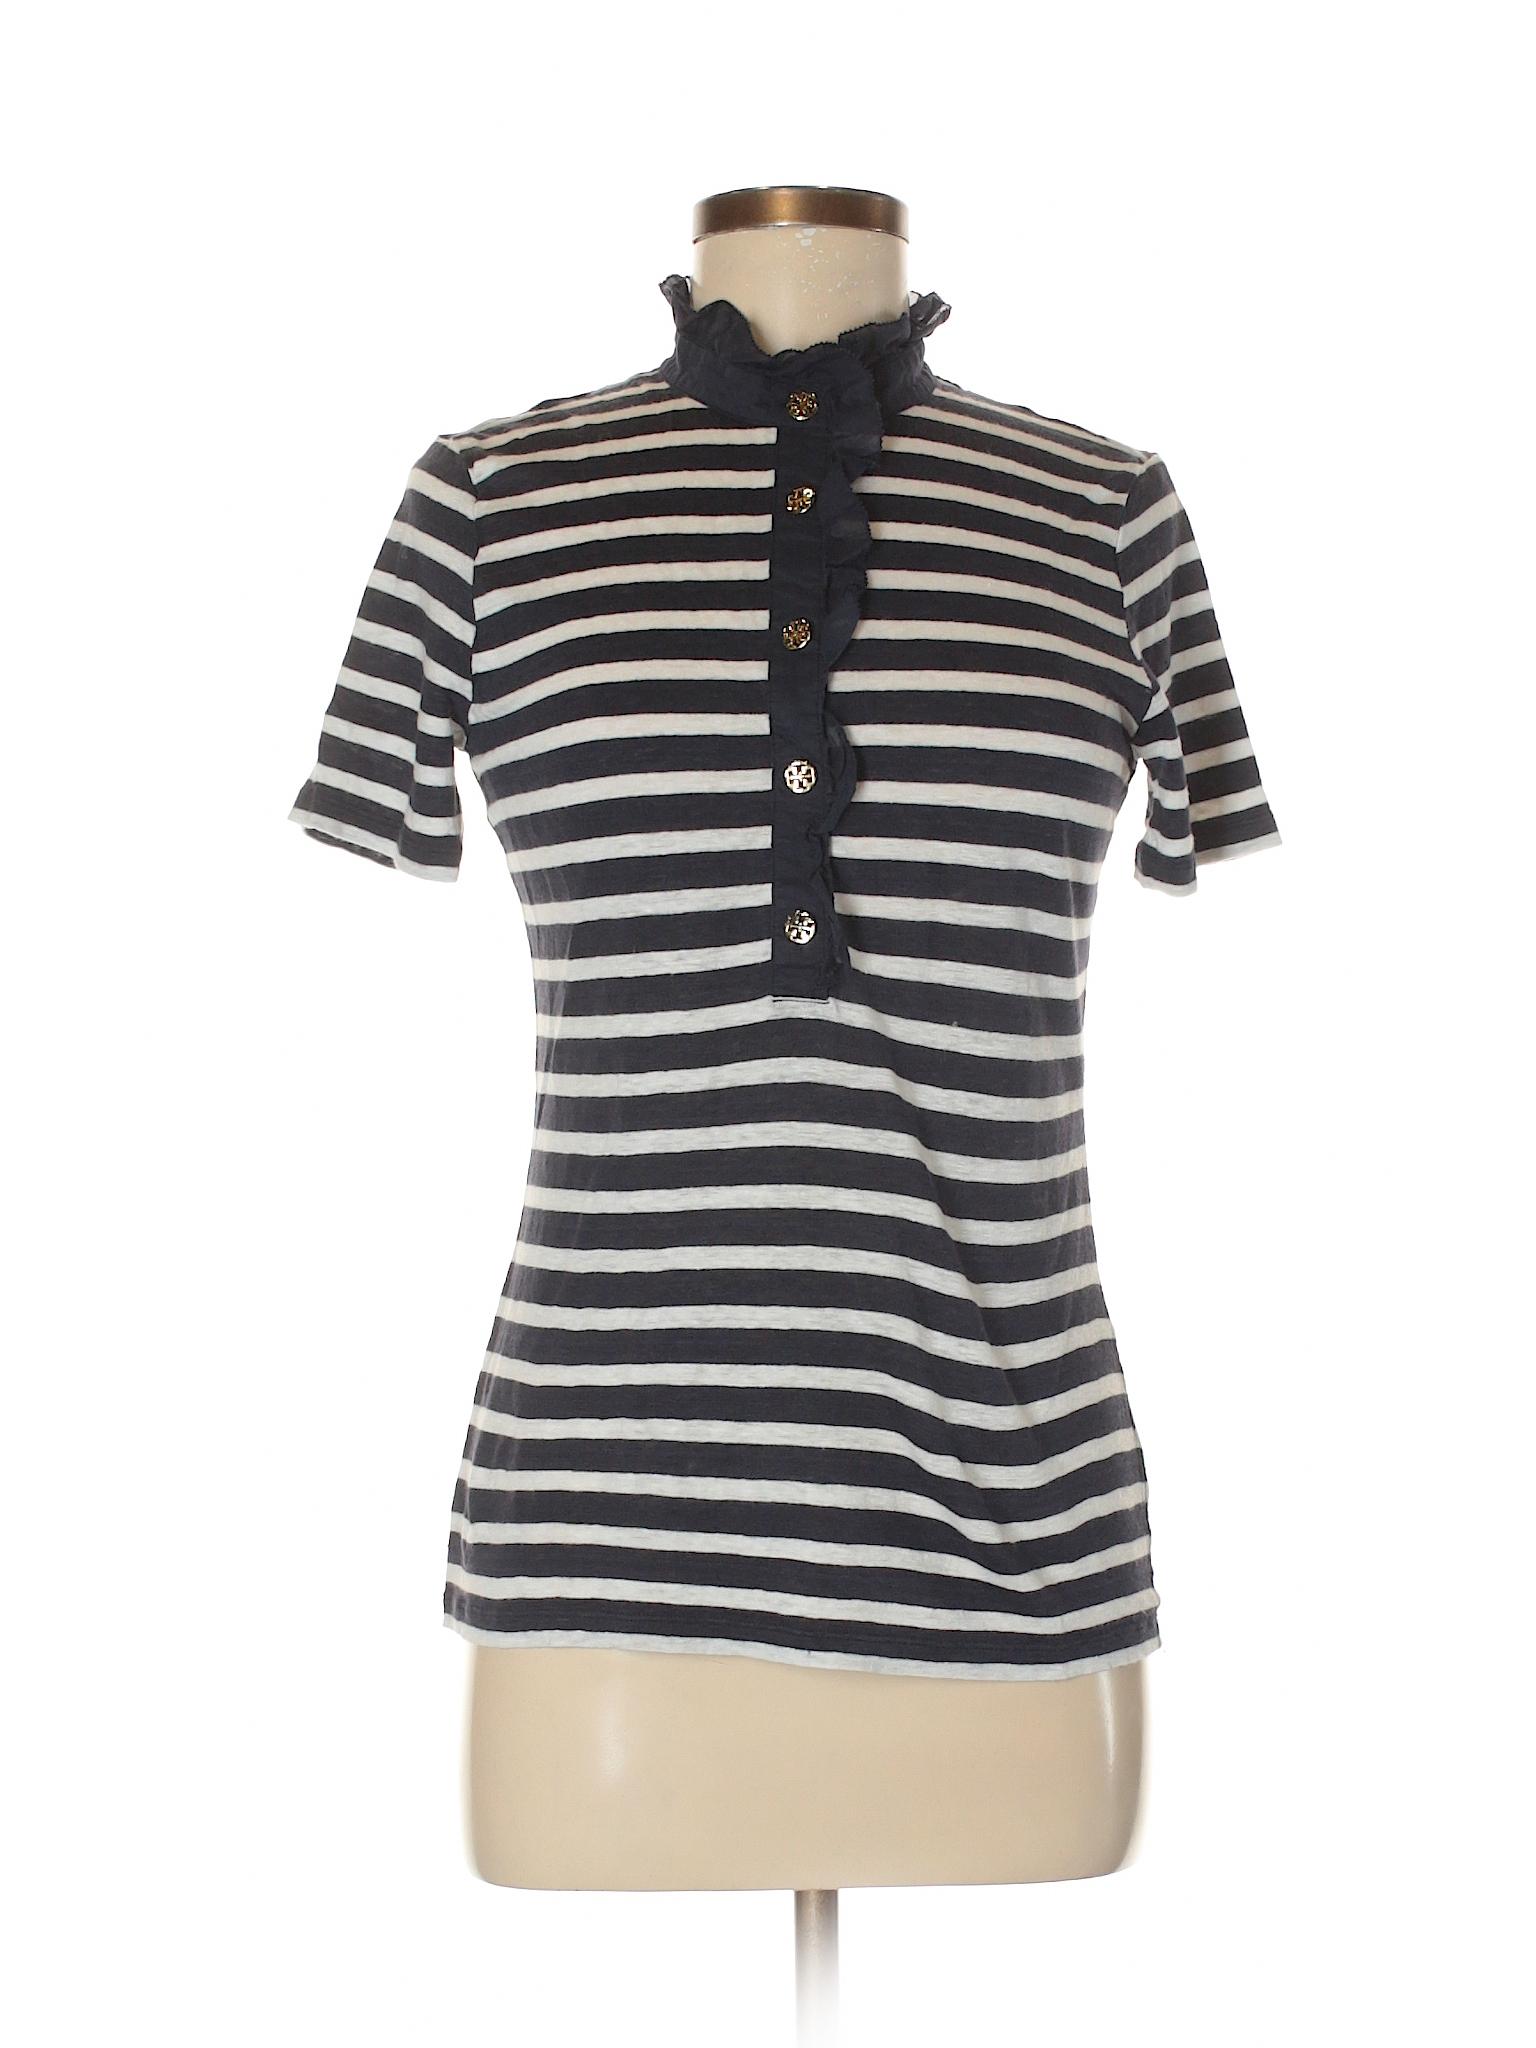 Tory burch 100 linen stripes navy blue short sleeve for Tory burch button down shirt